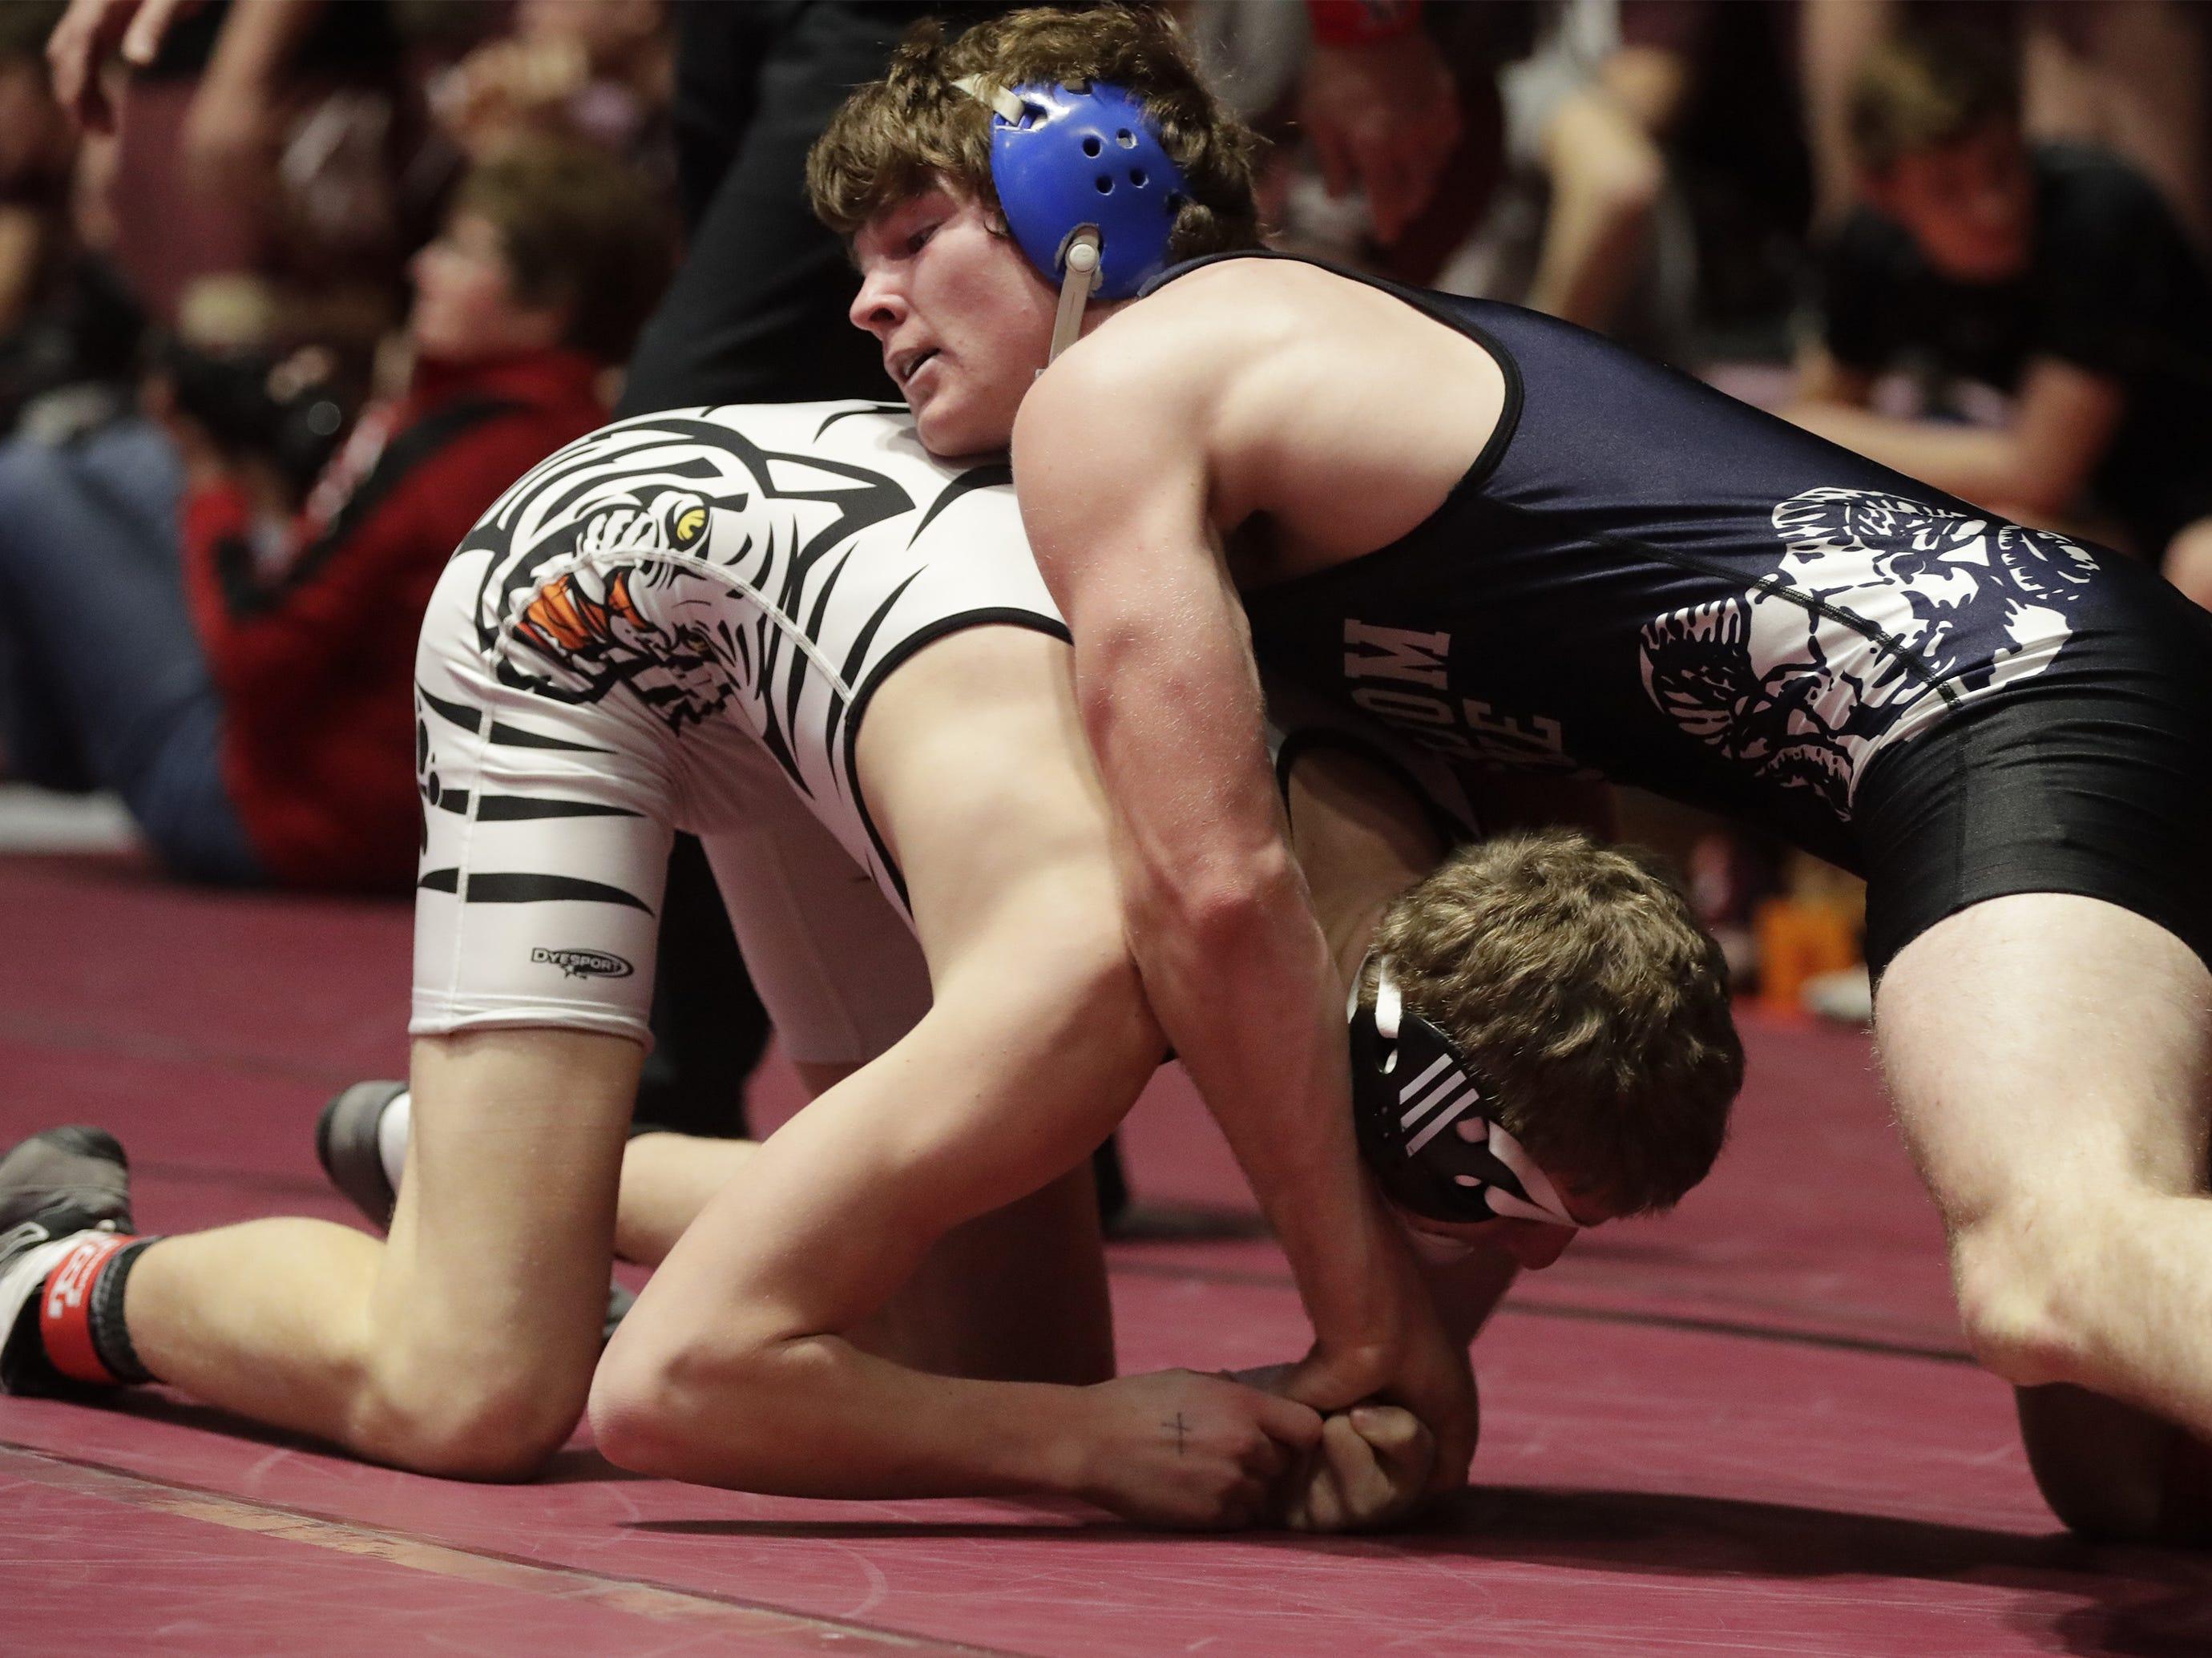 Random Lake's Grayson Vandenbush, top, wrestles Stratford's Logan Rueth during a 160-pound bout, Saturday, March 2, 2019, in Madison, Wis.